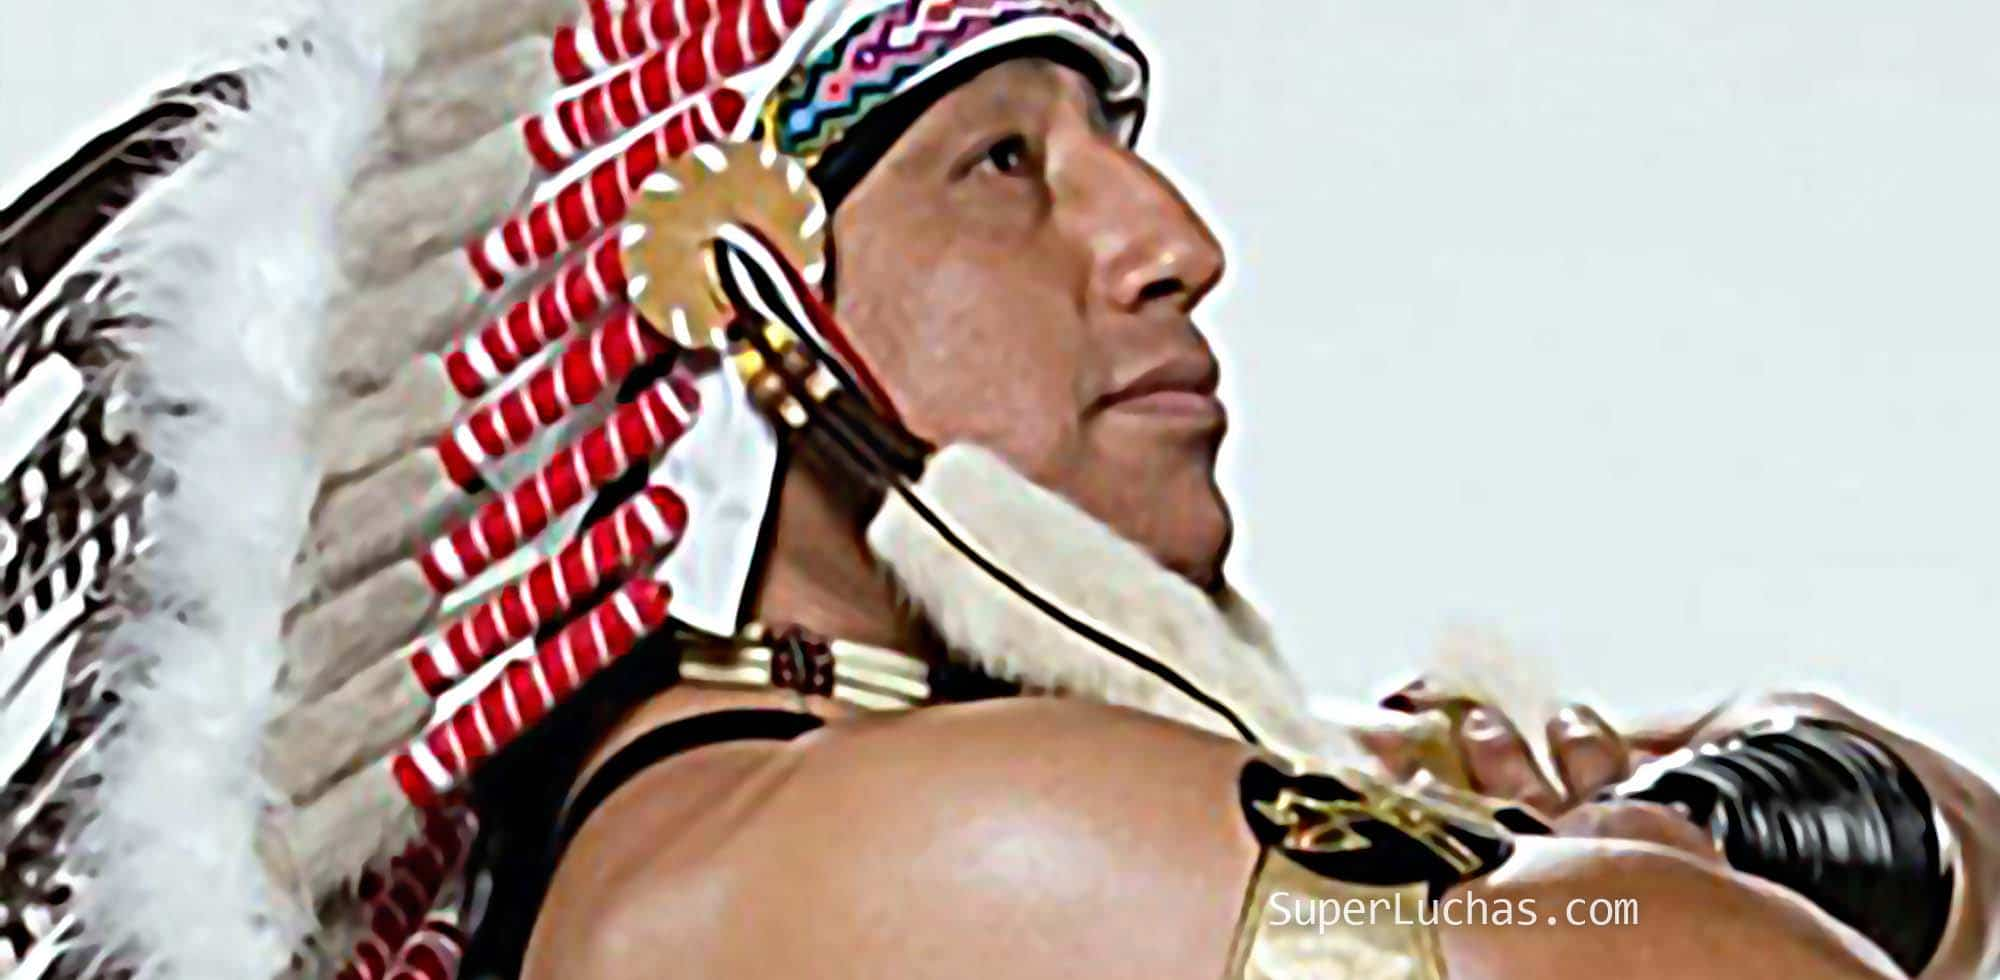 El mundo de la lucha libre reacciona a la muerte del Gran Apache 1